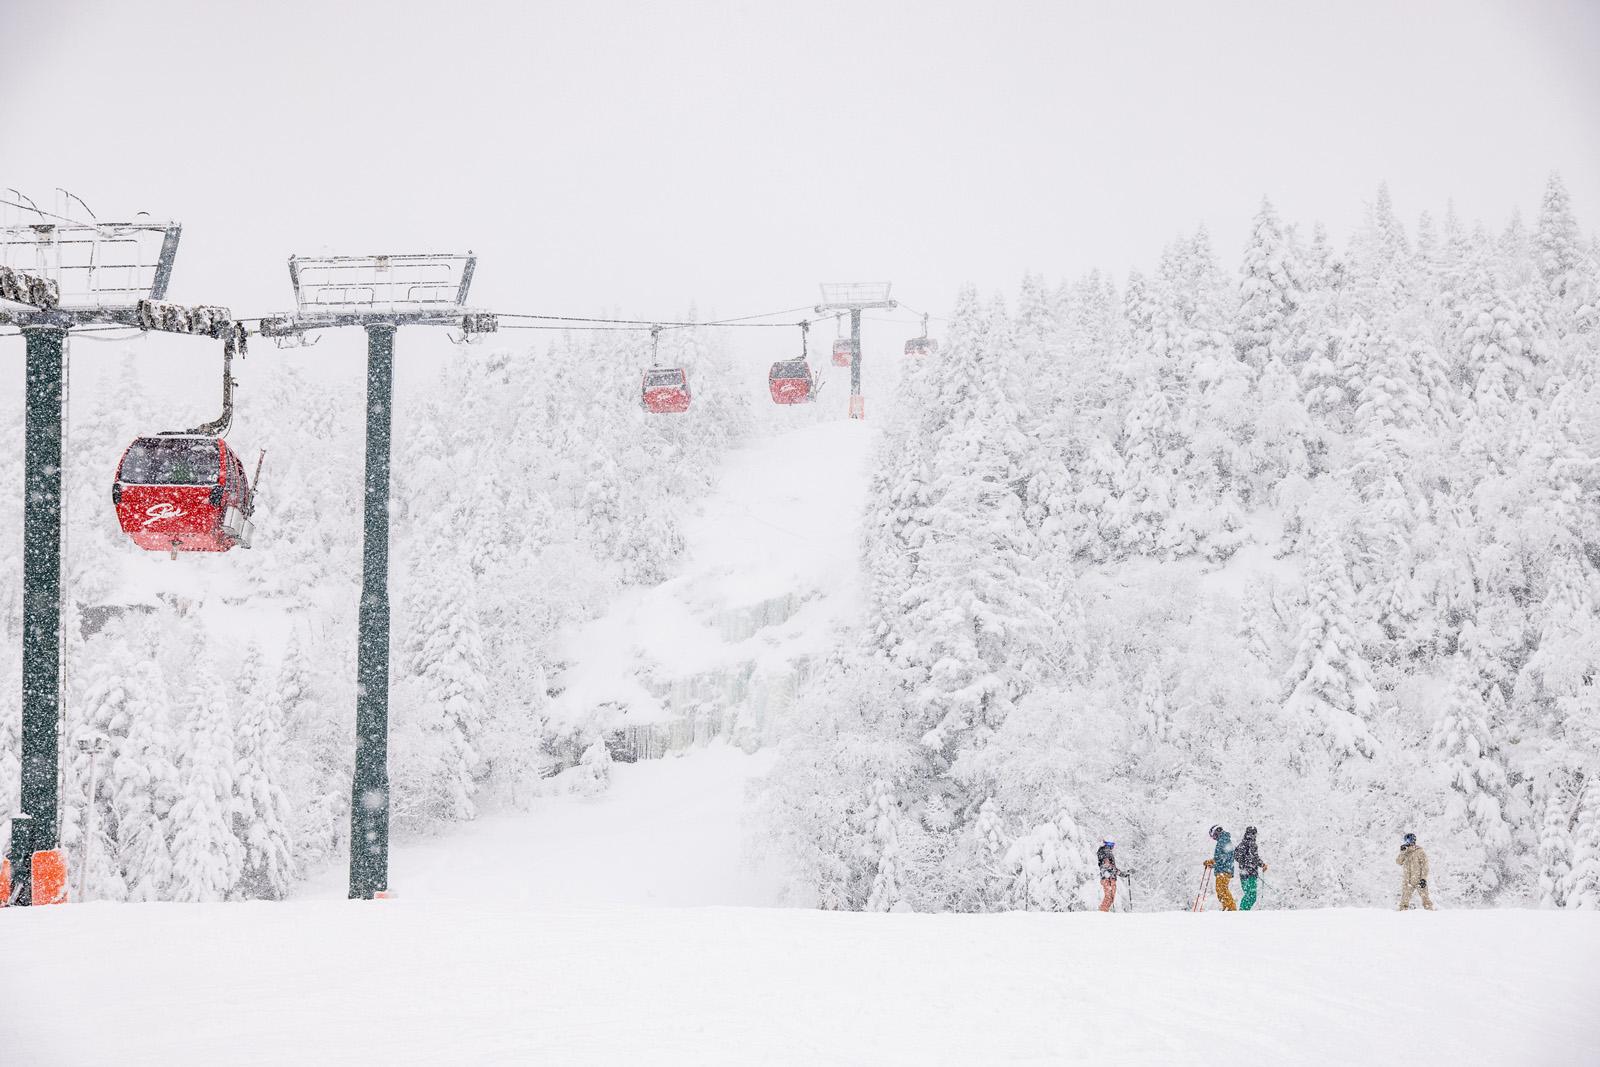 atomic maverick, the ski monster, stowe Vermont